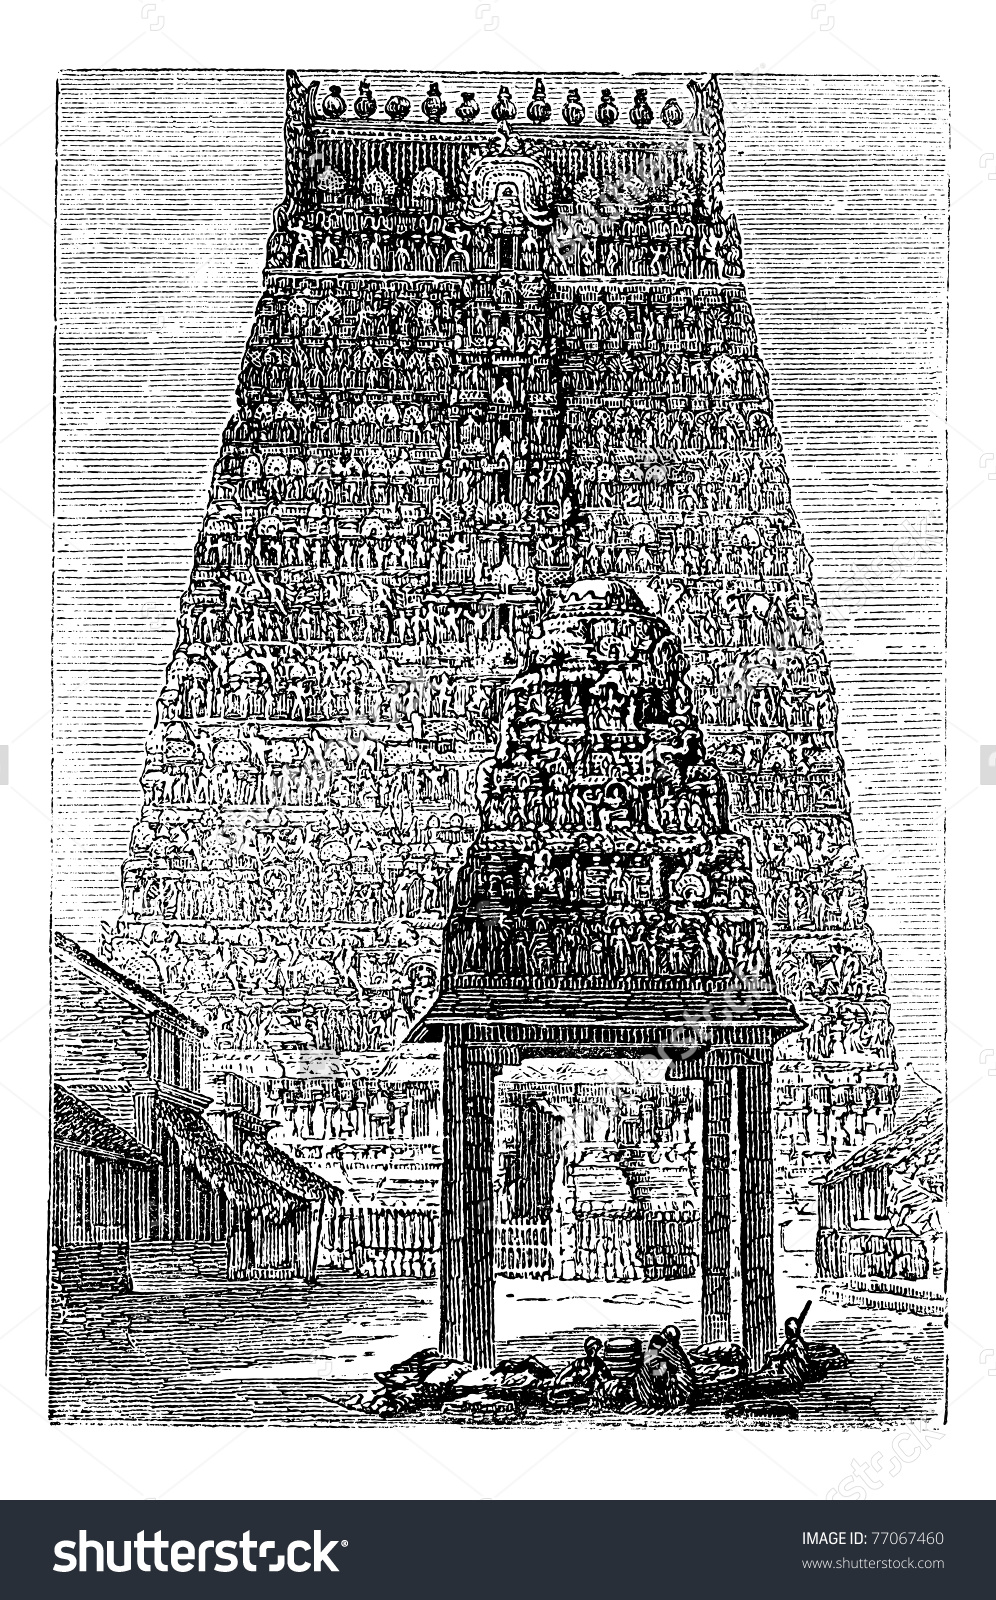 Kumbakonam Or Coombaconum, In Tamil Nadu, India, During The 1890s.